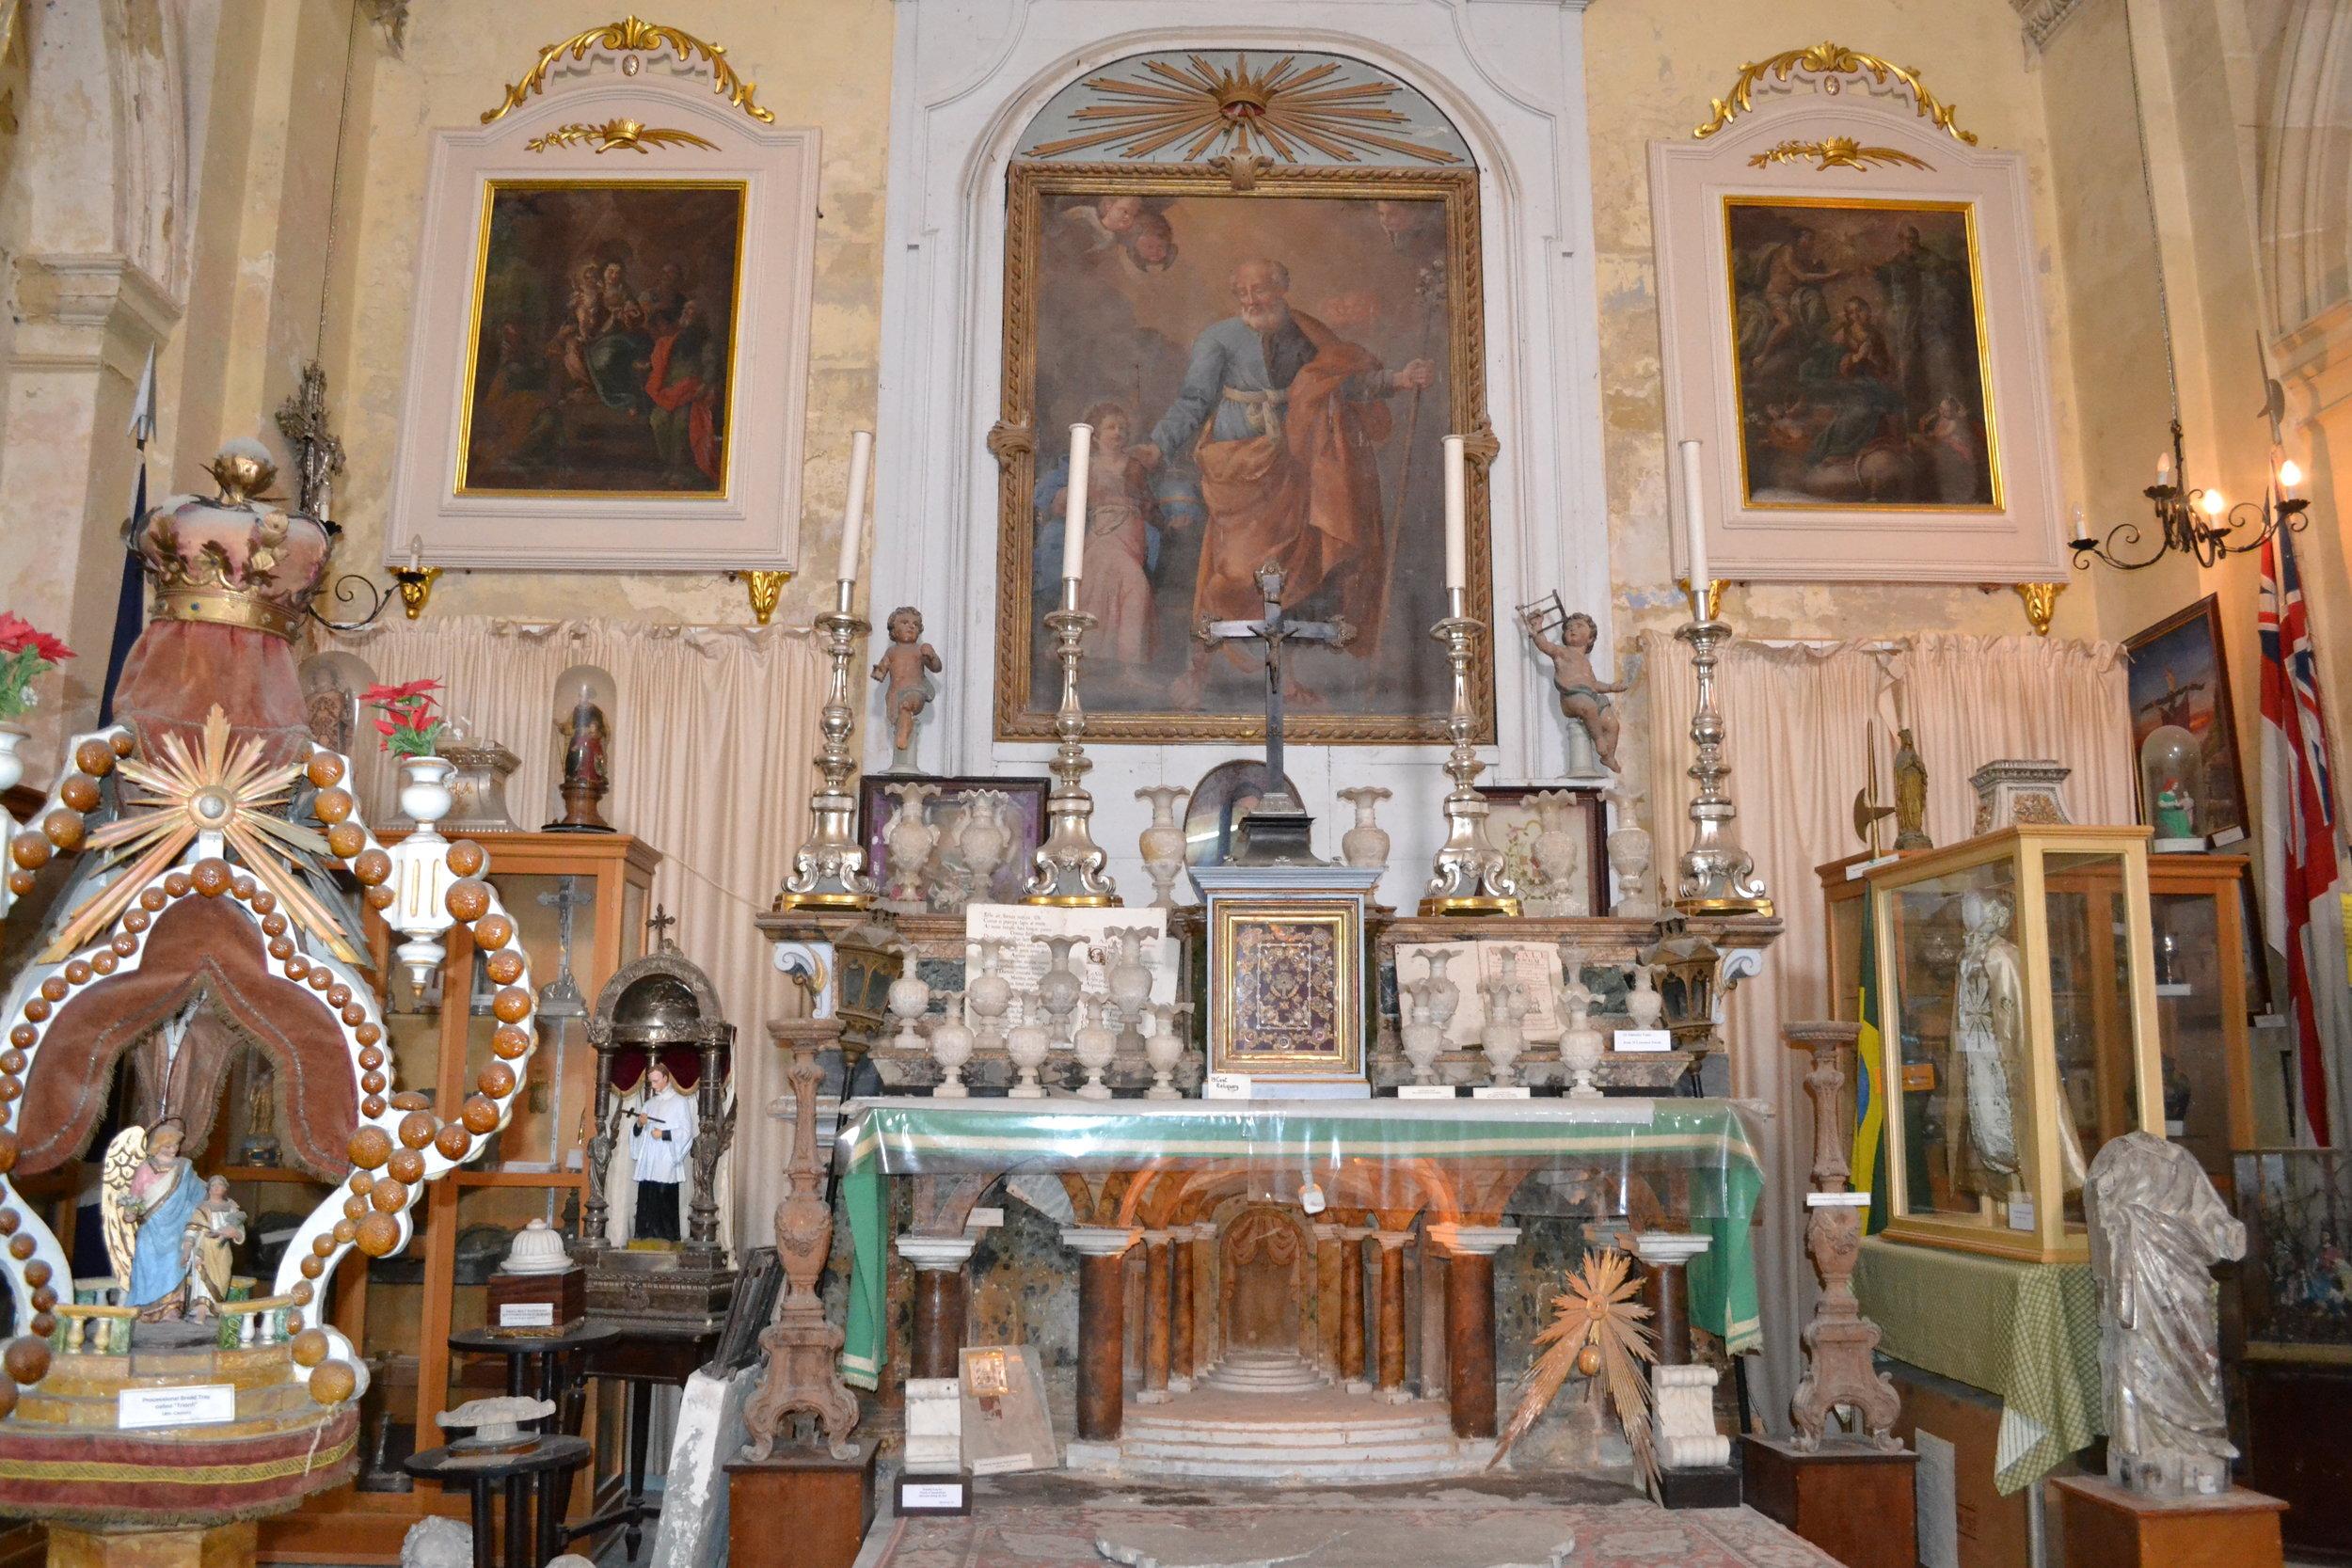 The St. Lawrence Church Museum in Vittoriosa (Birgu)